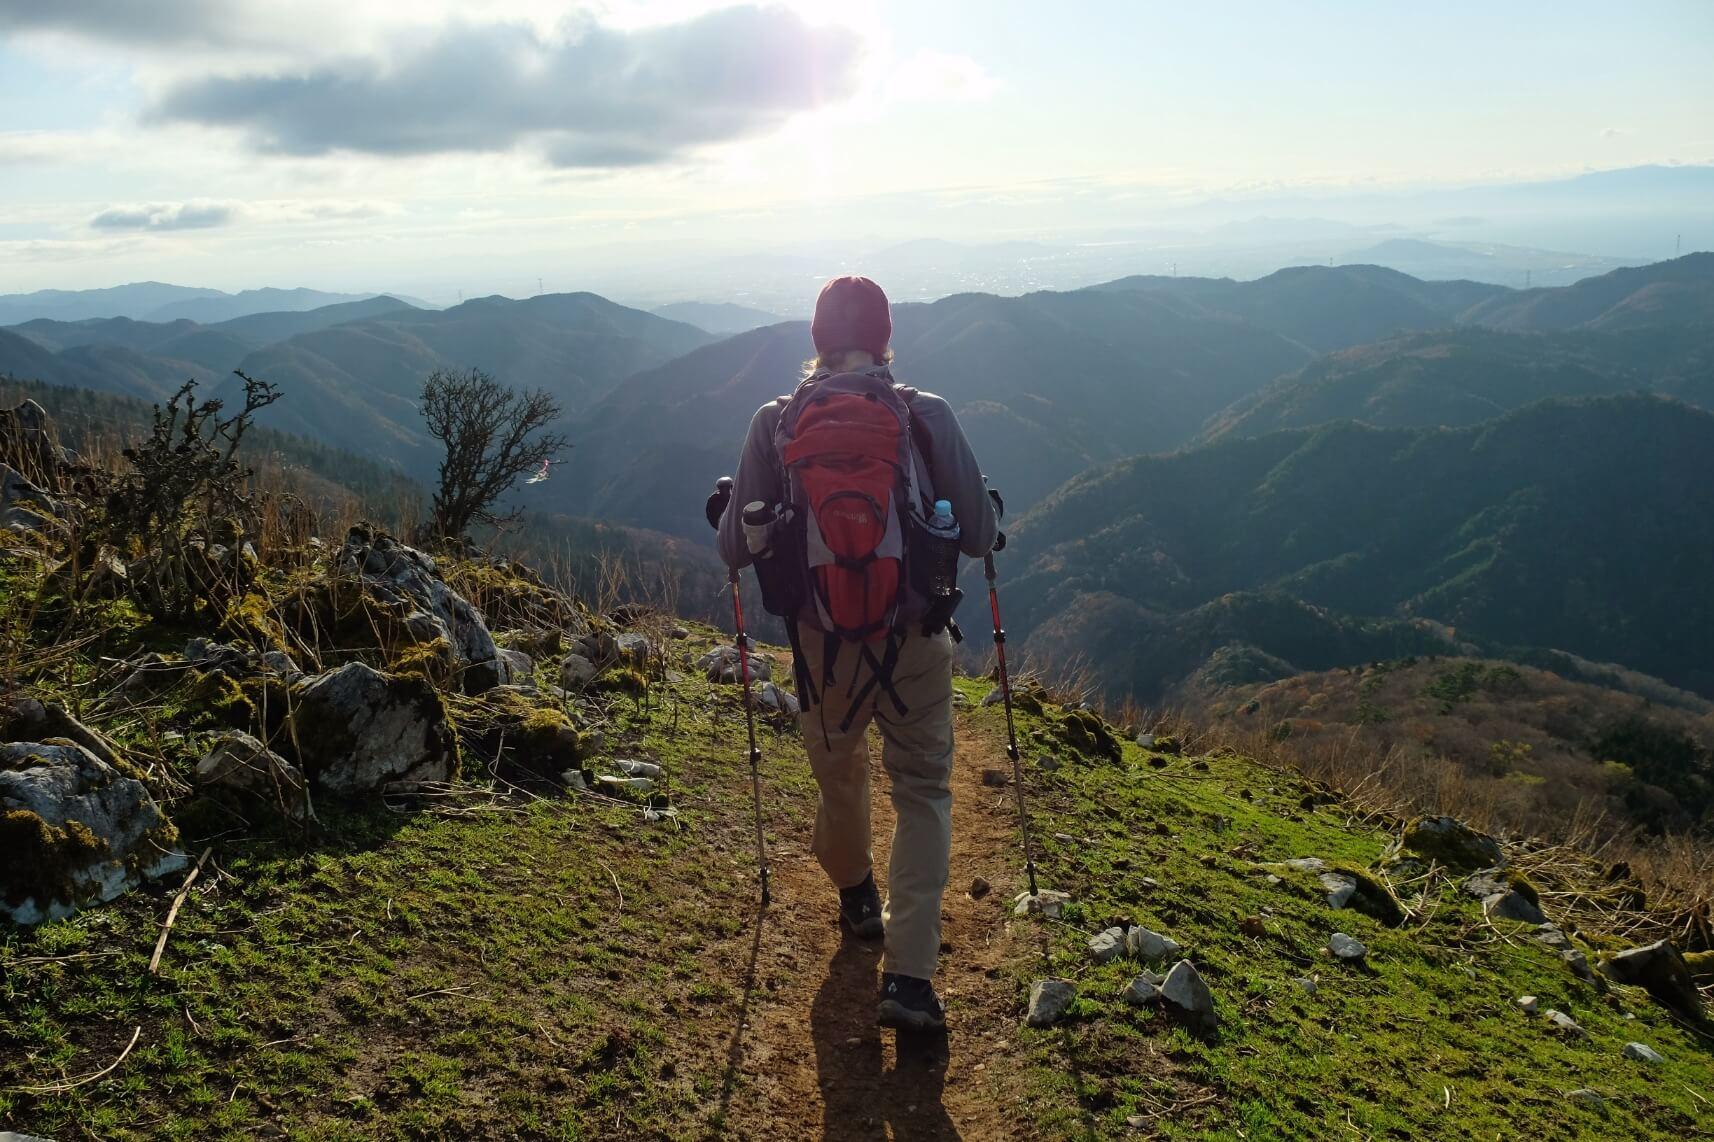 Fall Hiking on Mt. Ryozen in the Suzuka Mountains, Shiga